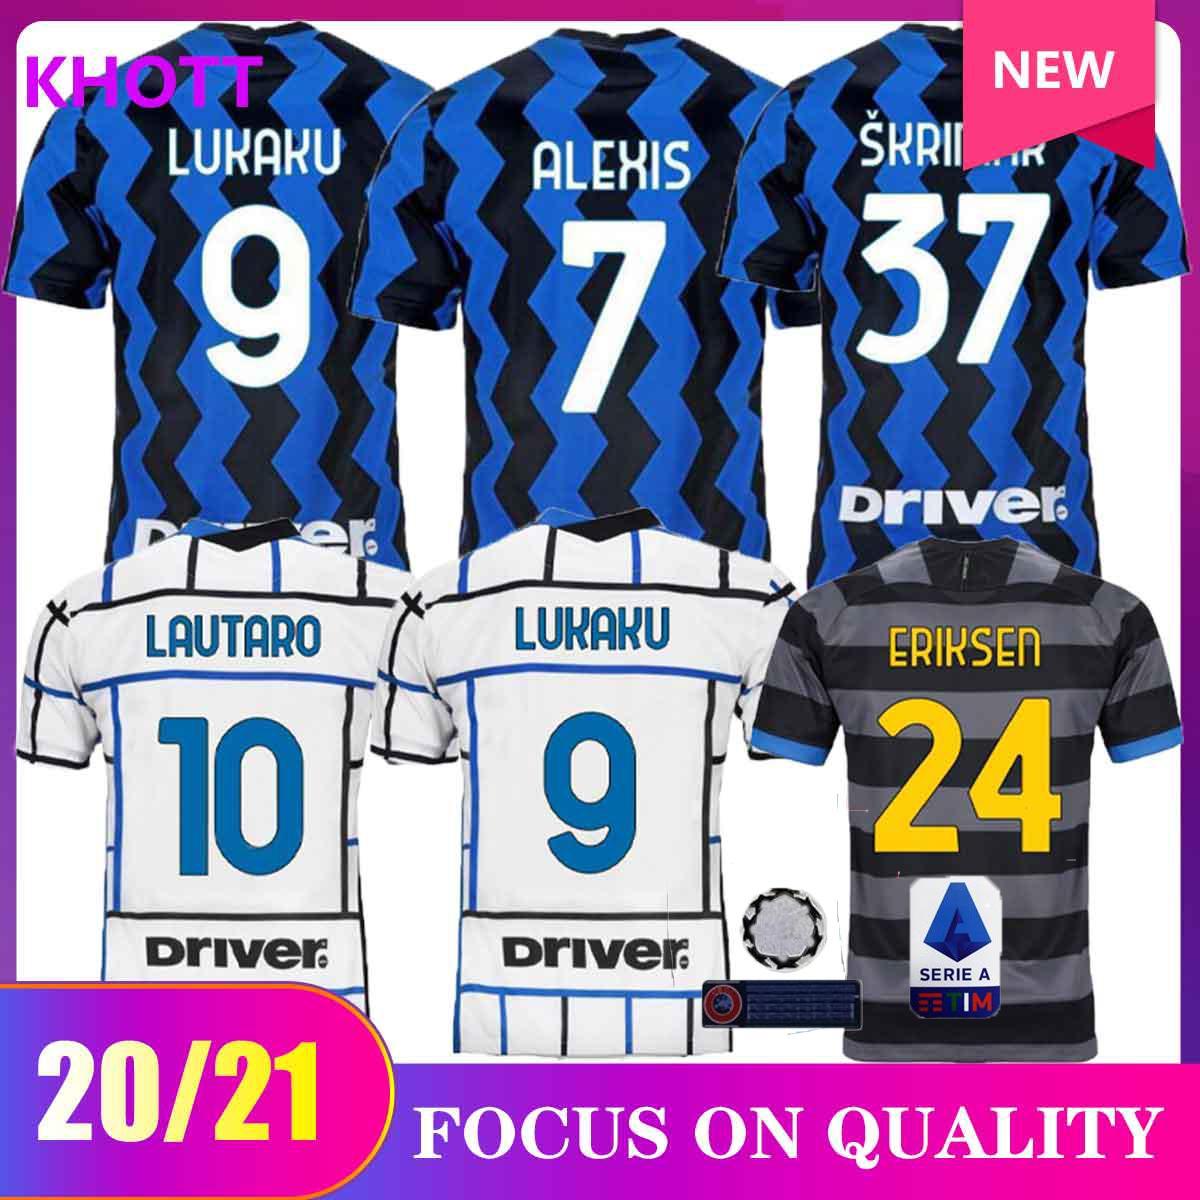 20 21 Lukaku Eriksen Lautaro Homex Away Soccer Jersey 2020 2021 Kit adulto Alexis Sensi Skriniar Brozovic Milano Camicia da calcio Set uniformi